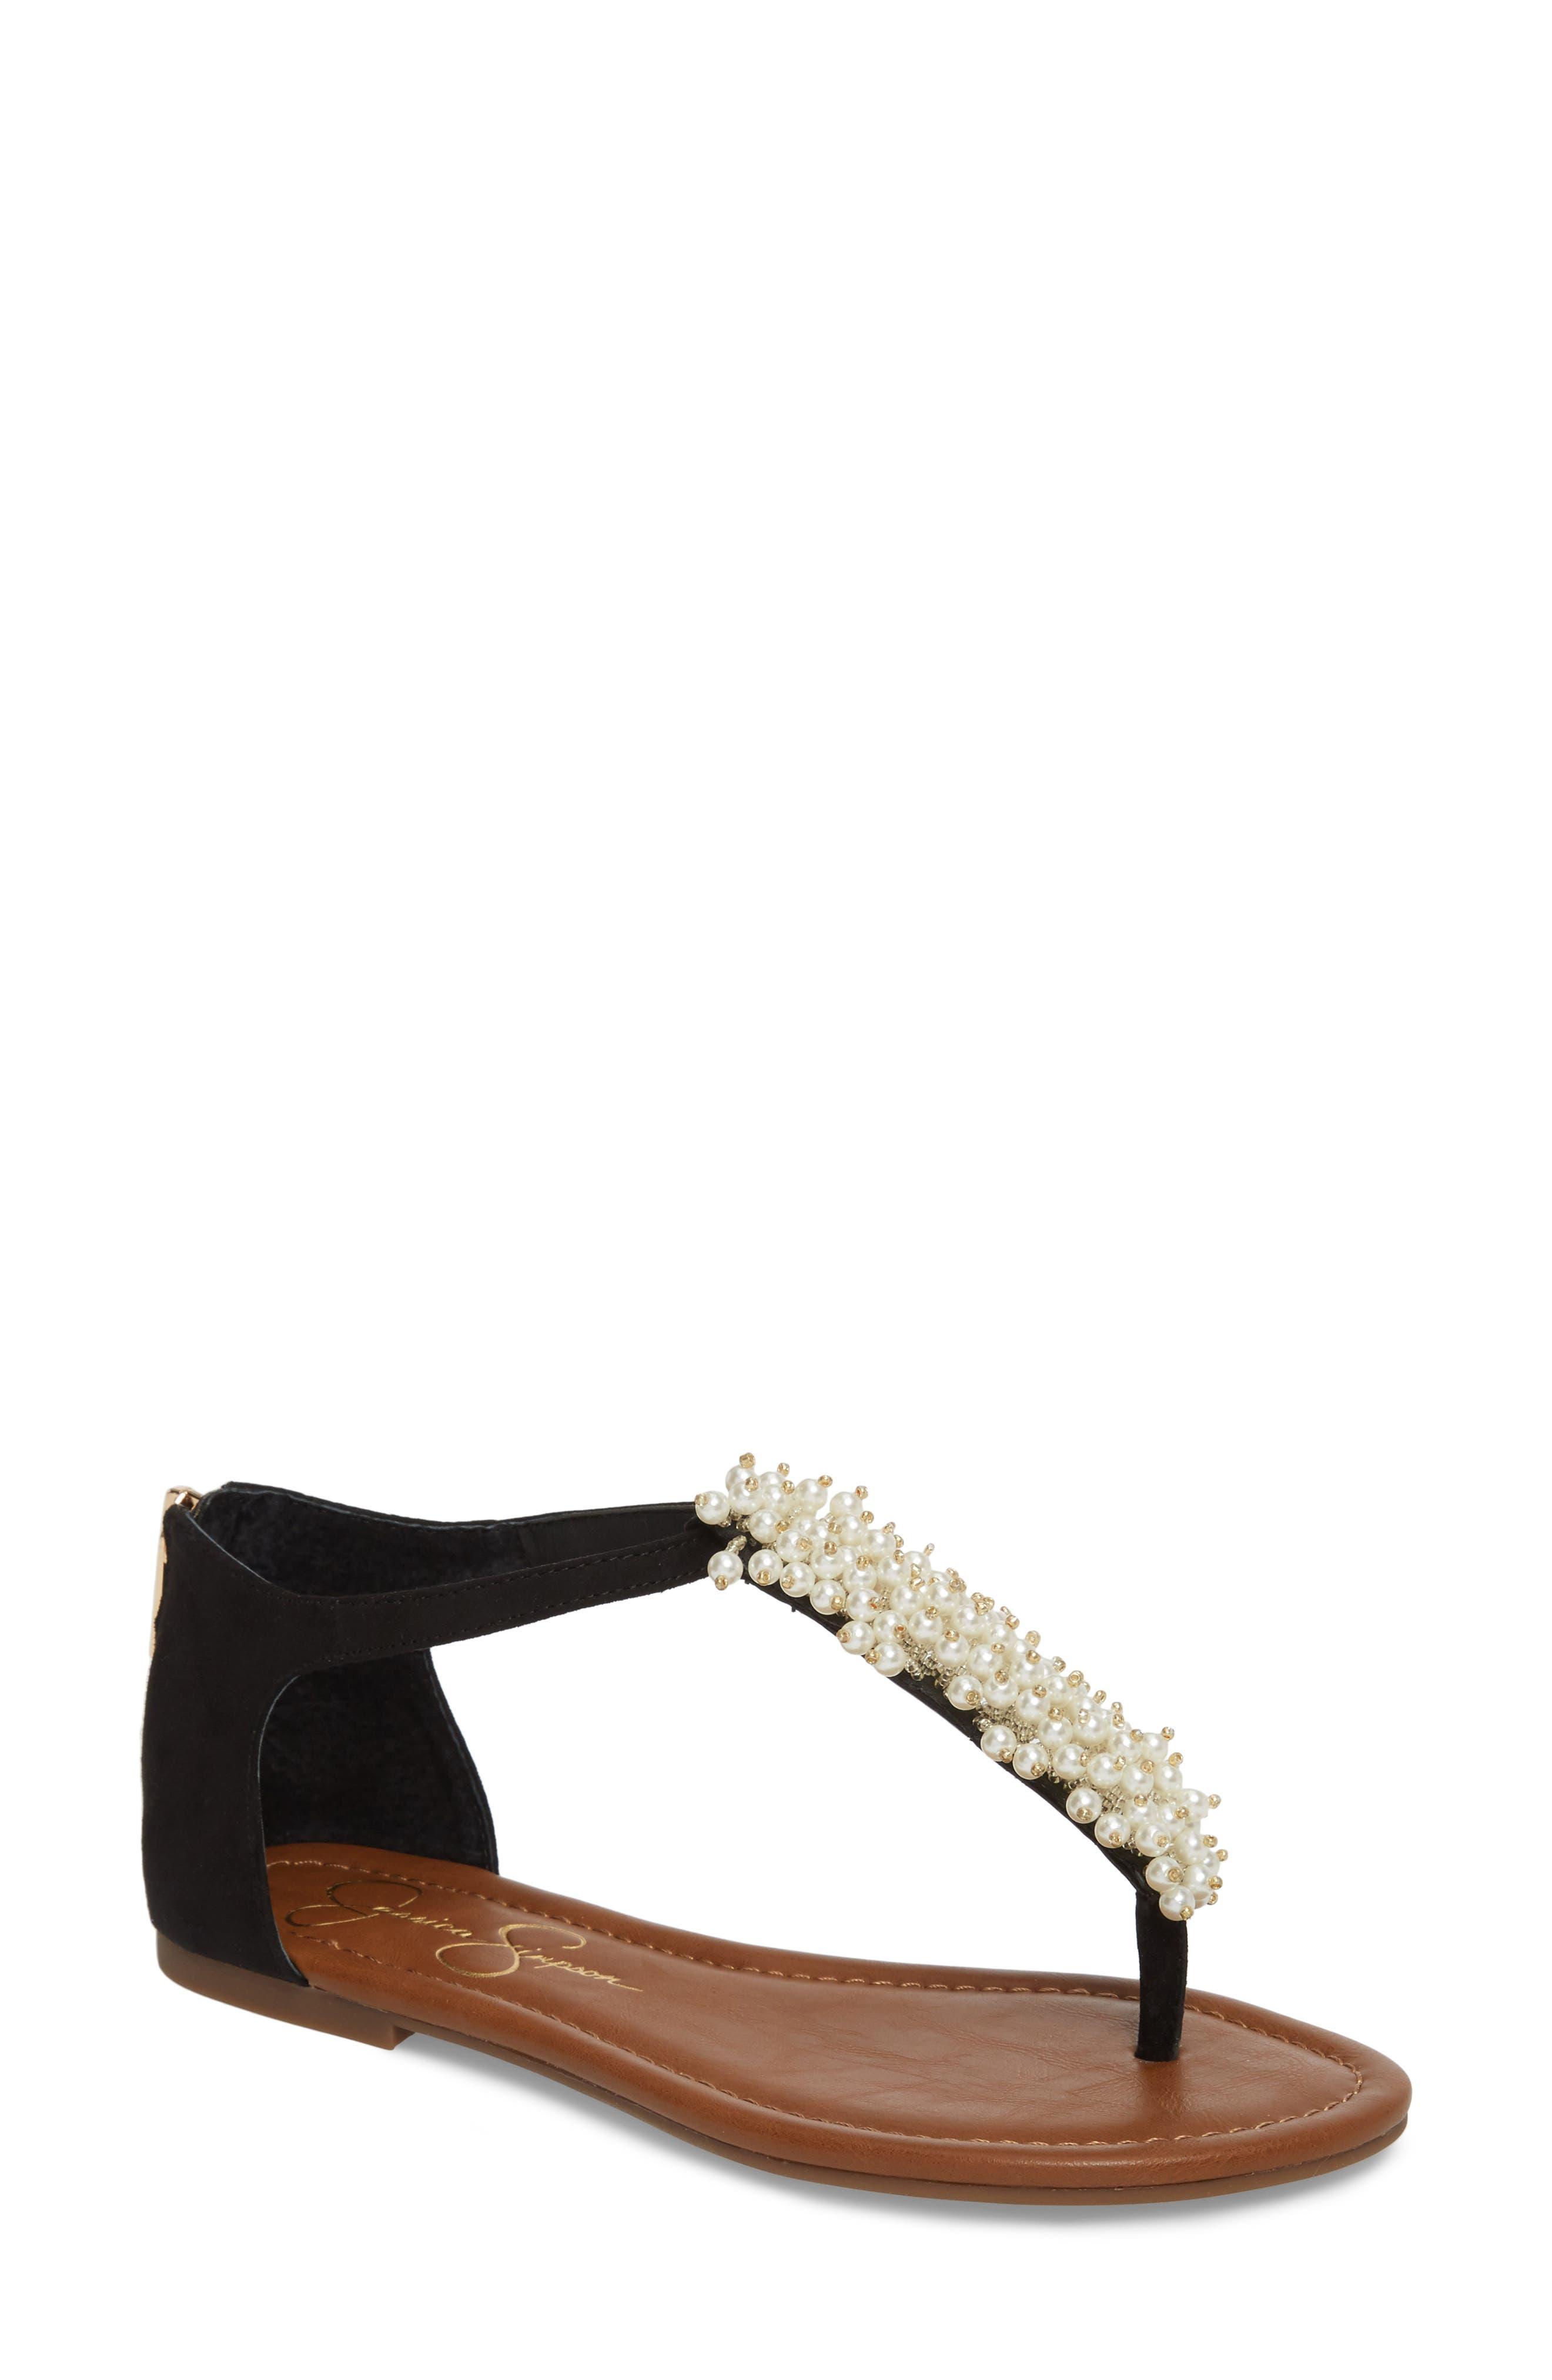 Kenton Crystal Embellished Sandal,                             Main thumbnail 1, color,                             001